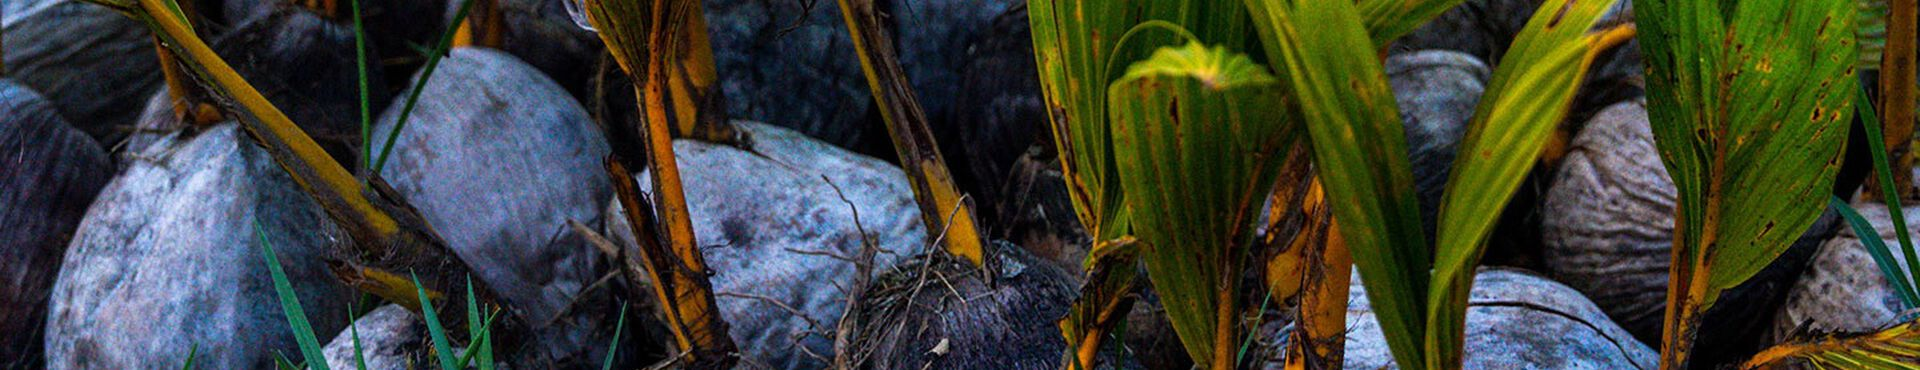 Banner - La reforestation au Guatemala